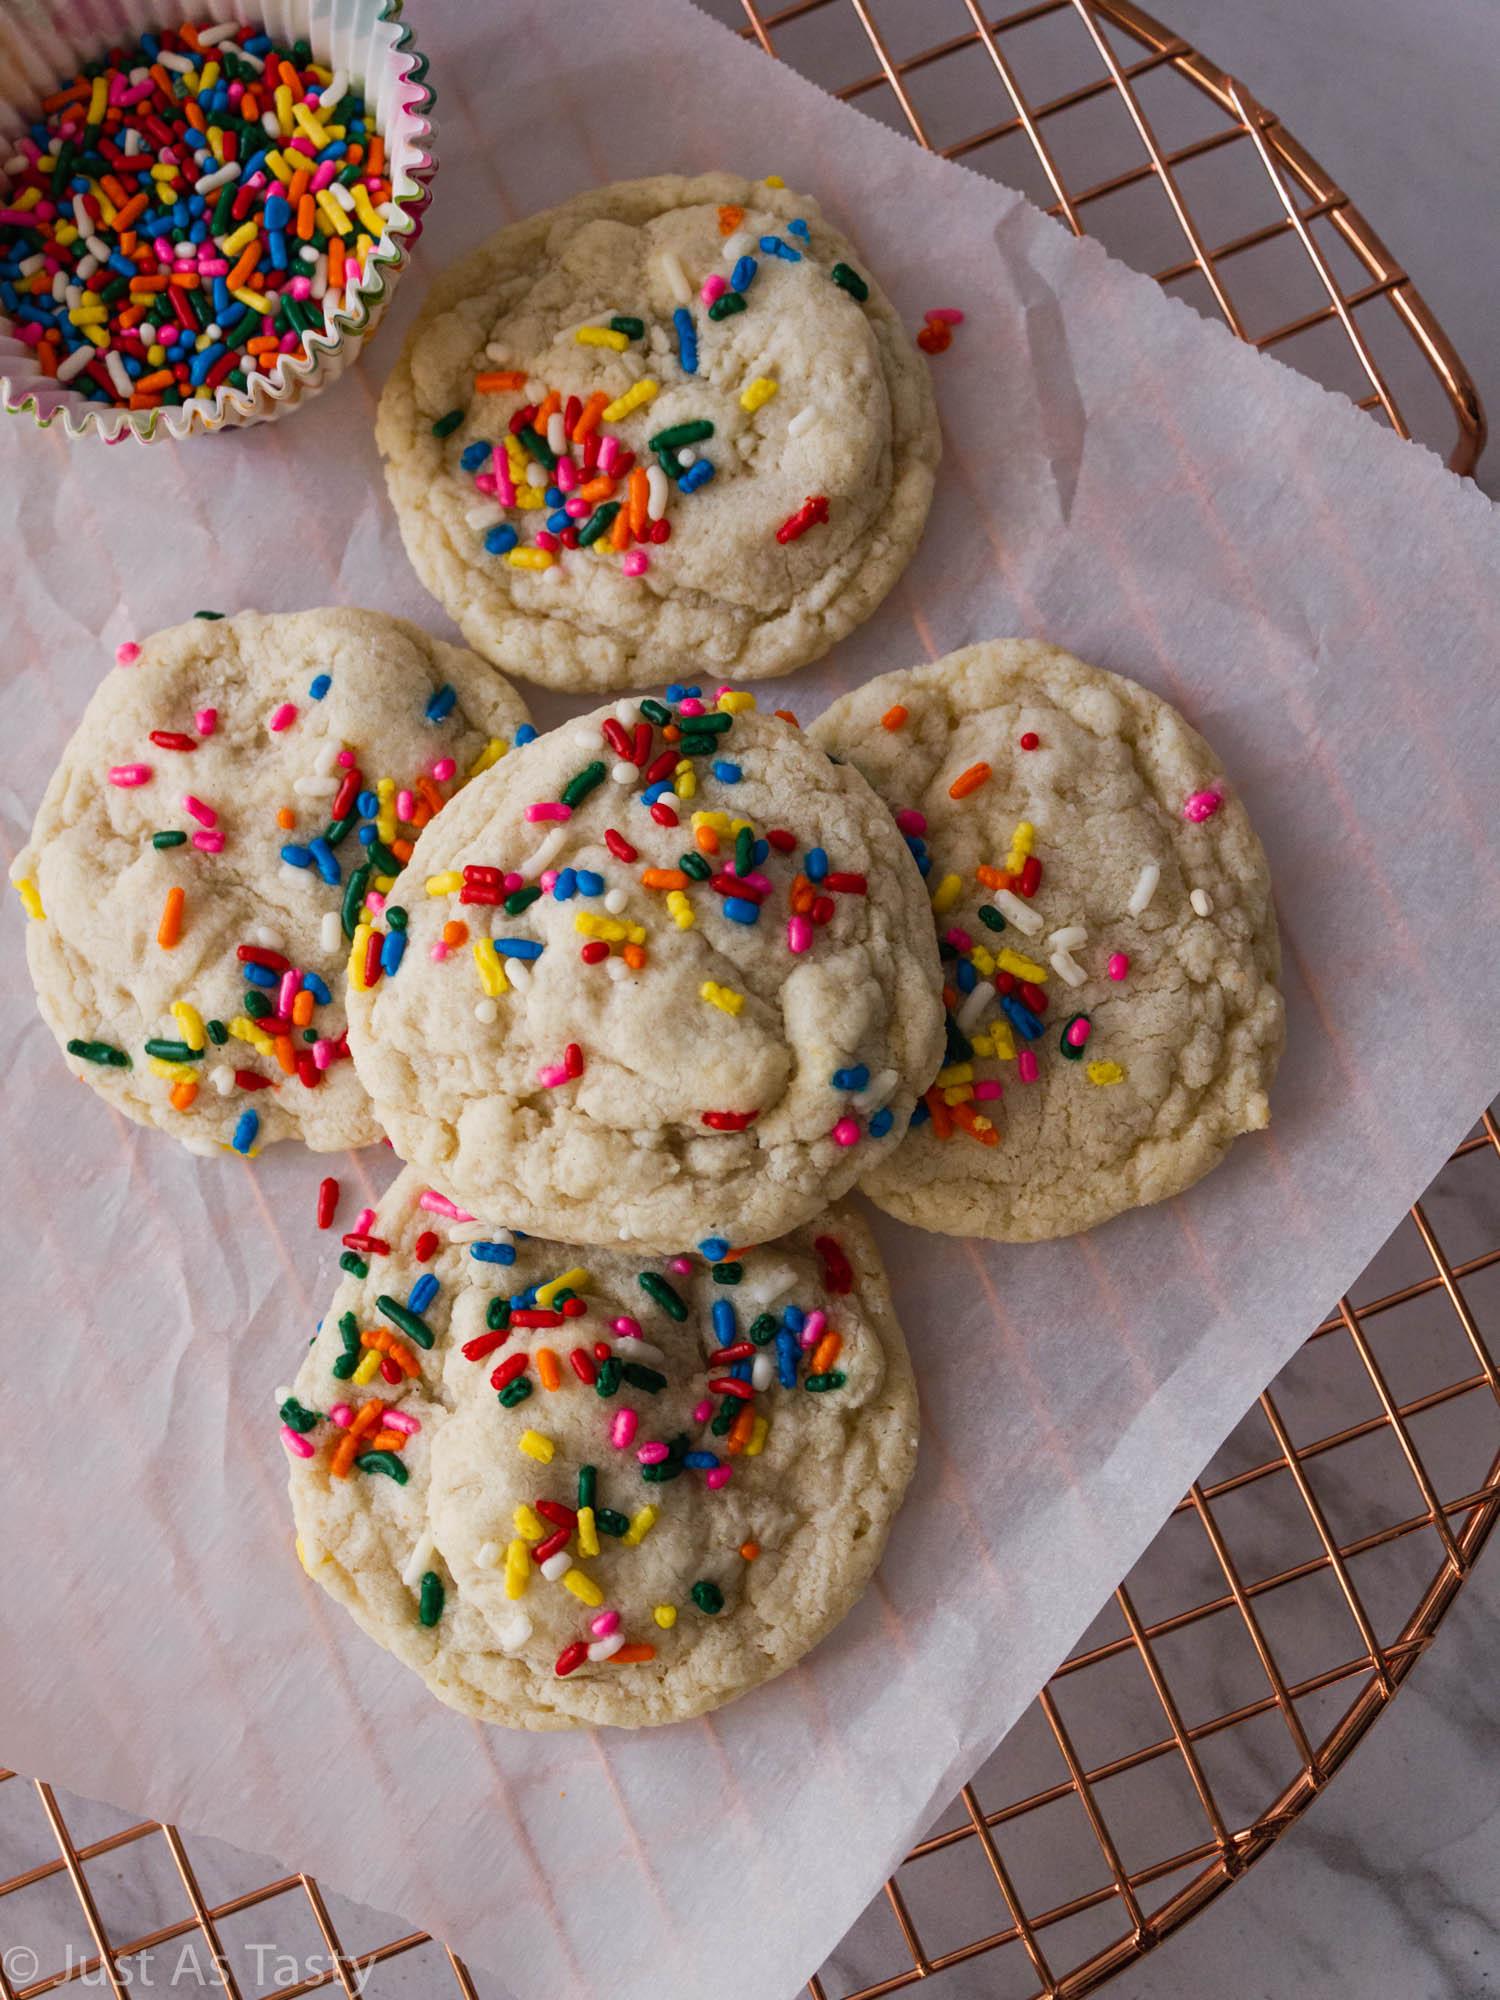 Sugar cookies topped with rainbow sprinkles.